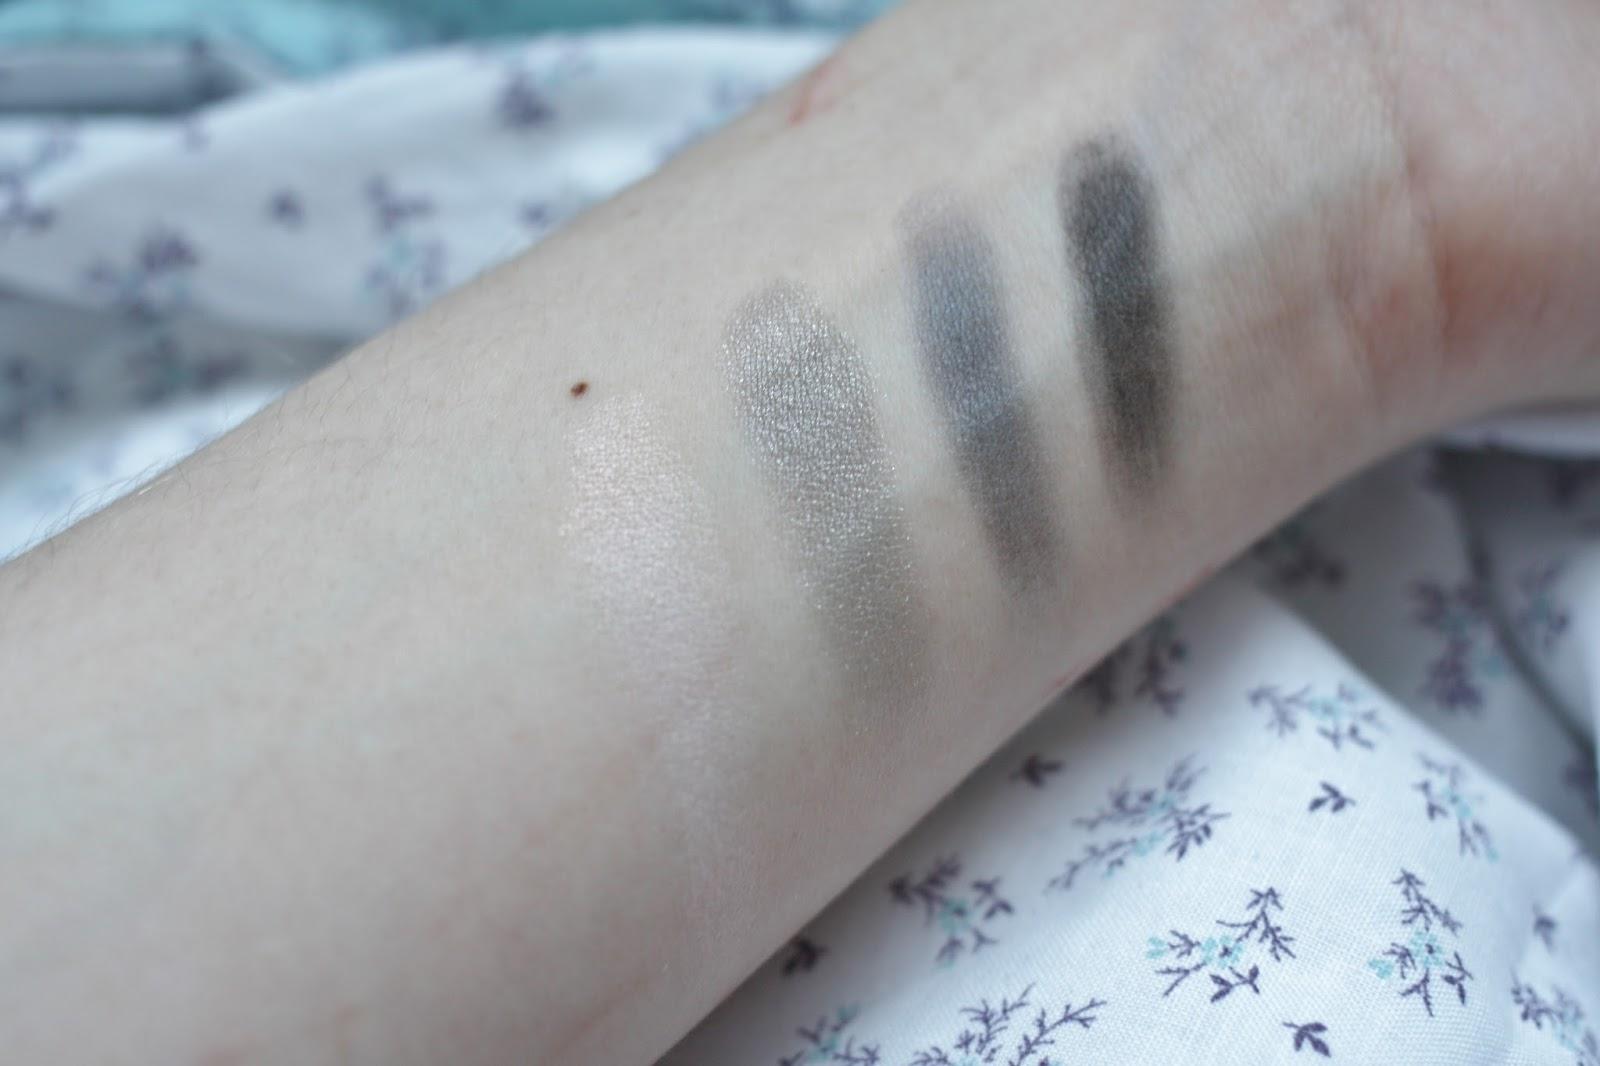 Nars Dual Intensity Eyeshadow Palette Swatches